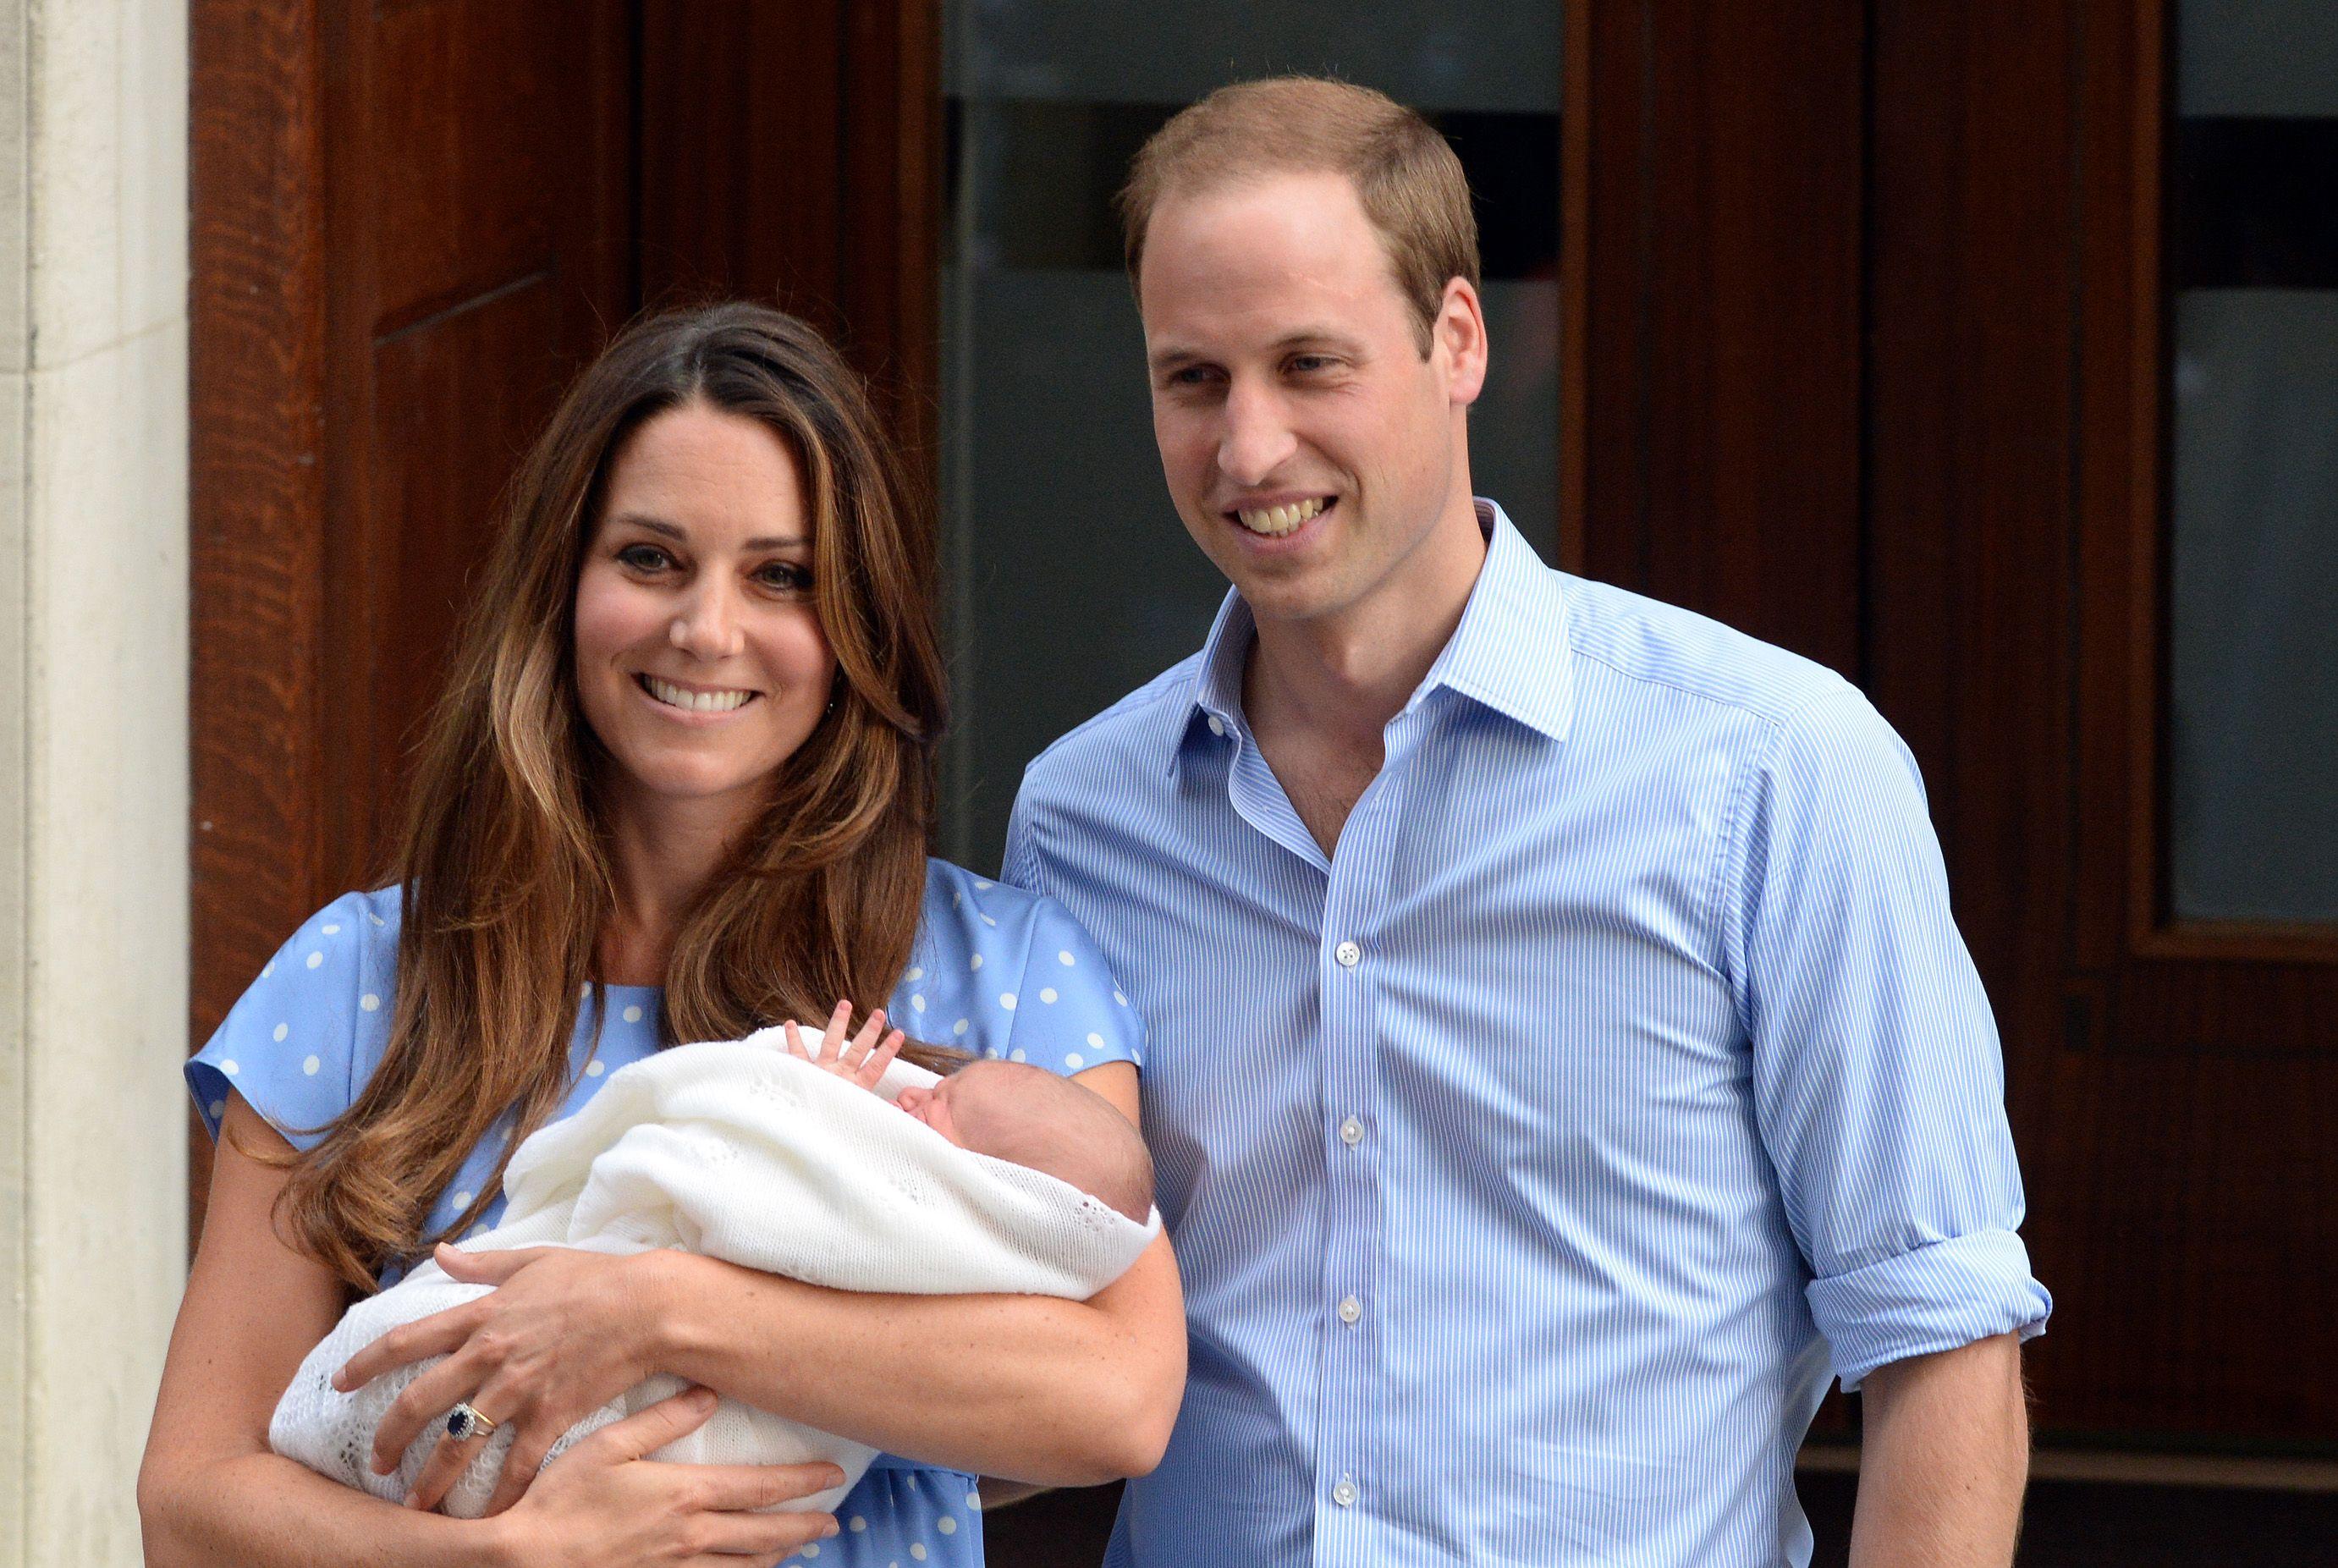 Prince George, Princess Charlotte, & Prince Louis's Cutest Moments